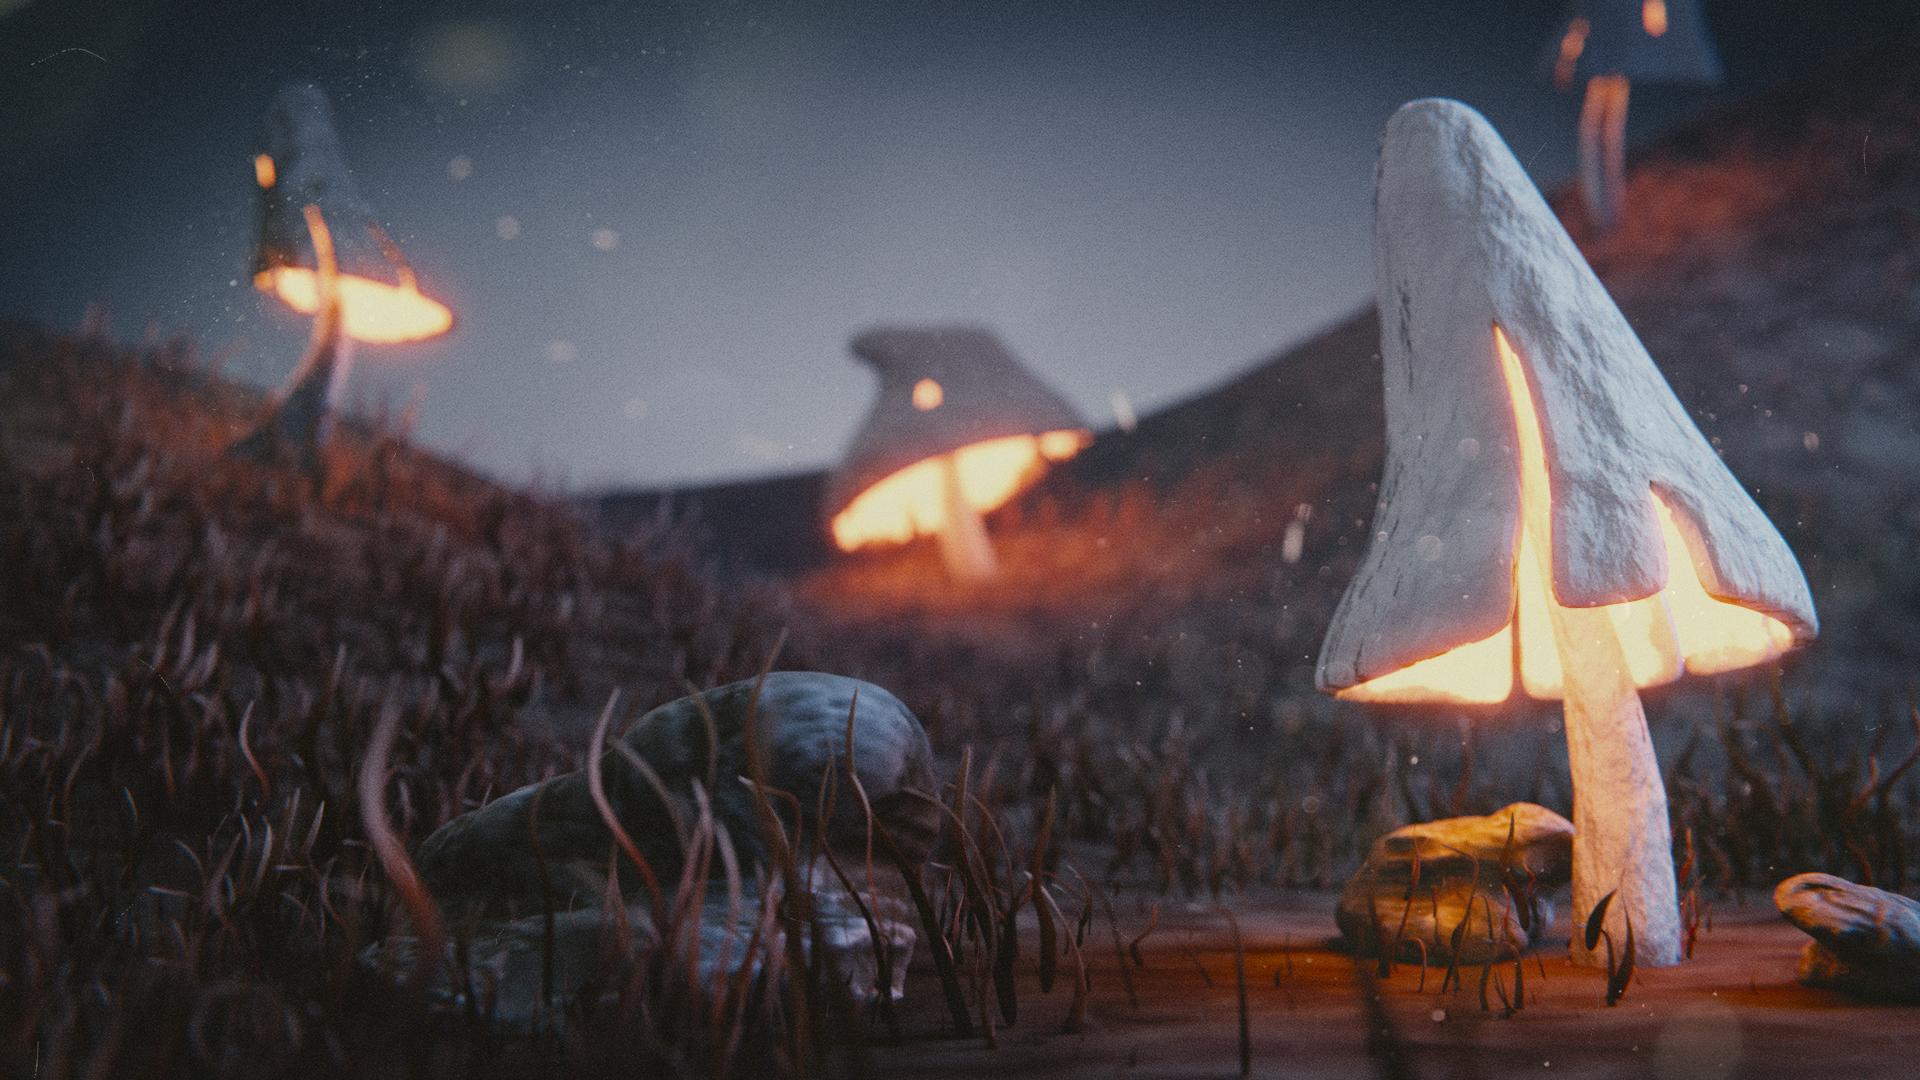 Mushroom-Scene-by-dumptherain.jpg